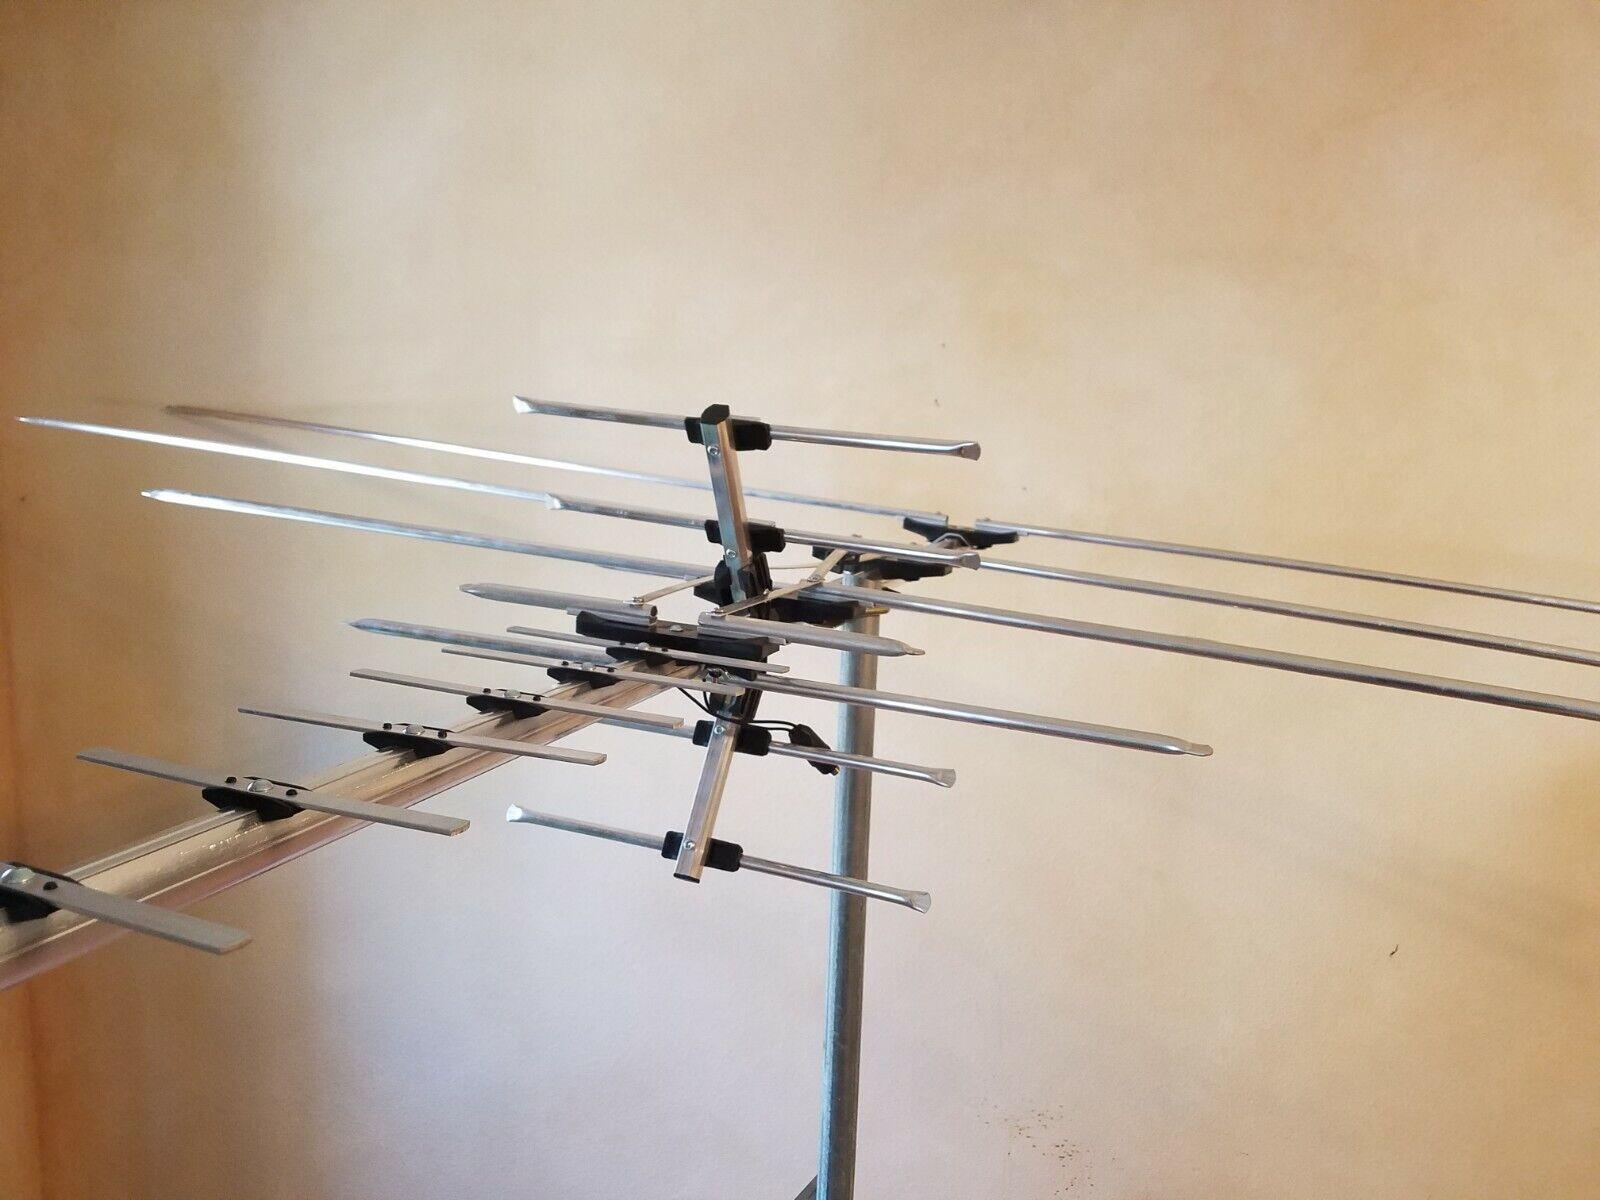 OUTPERFORMS 990 MILE TV ANTENNAS HDTV Digital UHF/VHF FM Radio Long Range